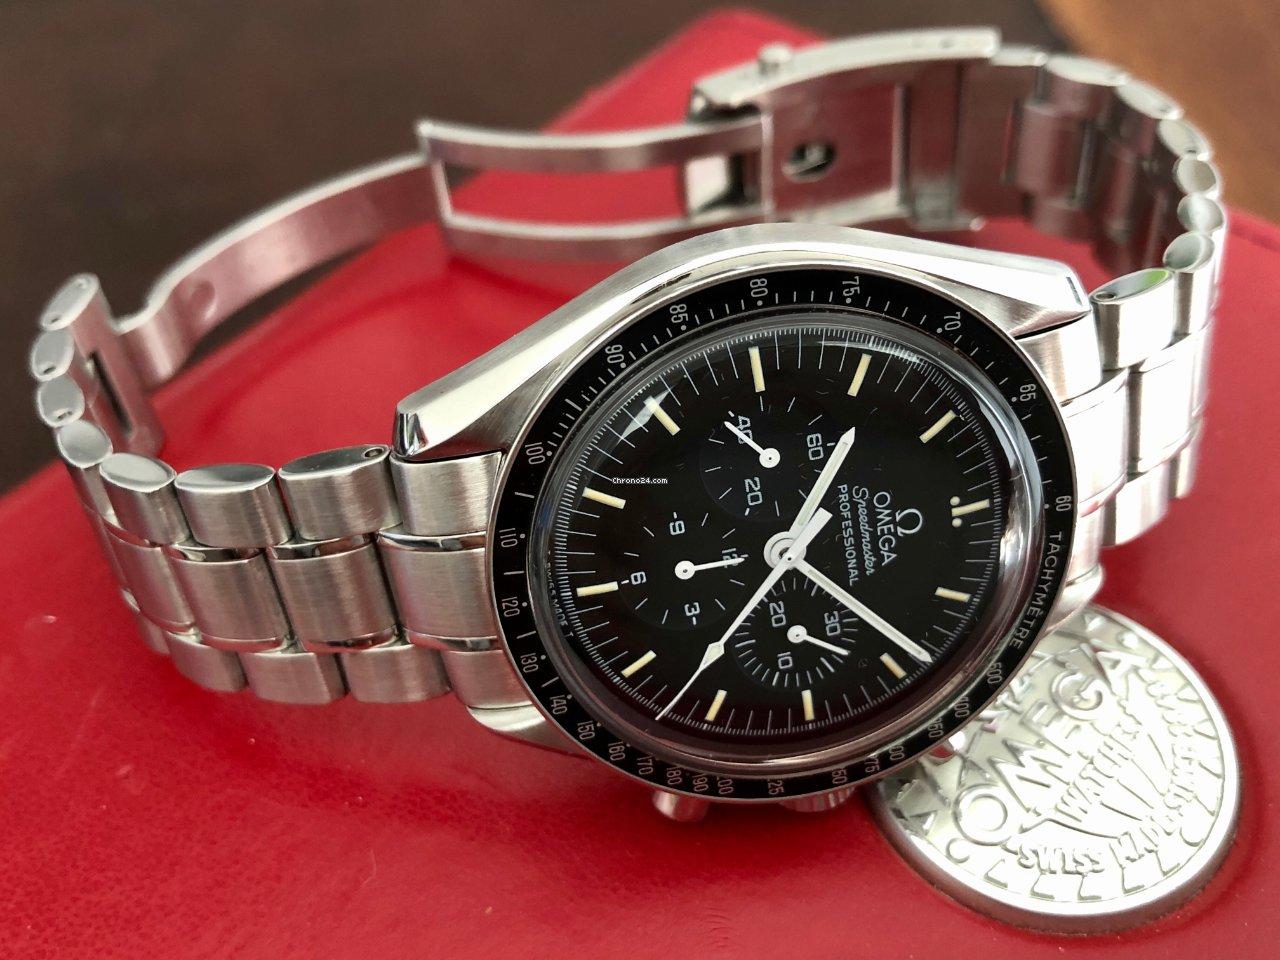 Omega Speedmaster Professional Moonwatch 3870.50.31 (145.0022 - 345.0022) 1997 ikinci el